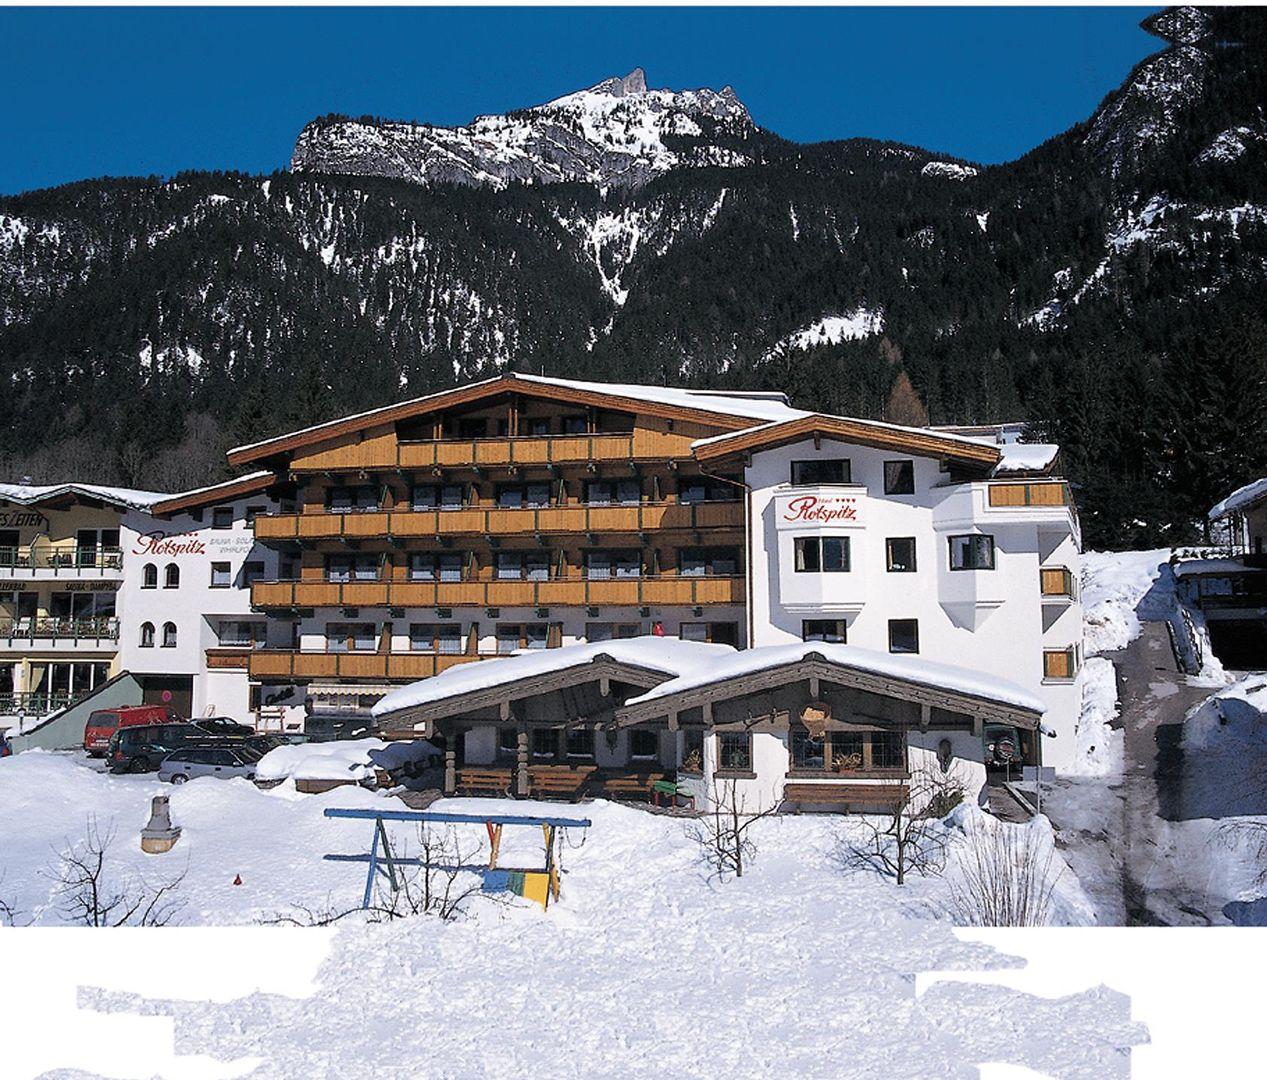 Family Hotel Rotspitz - Slide 1